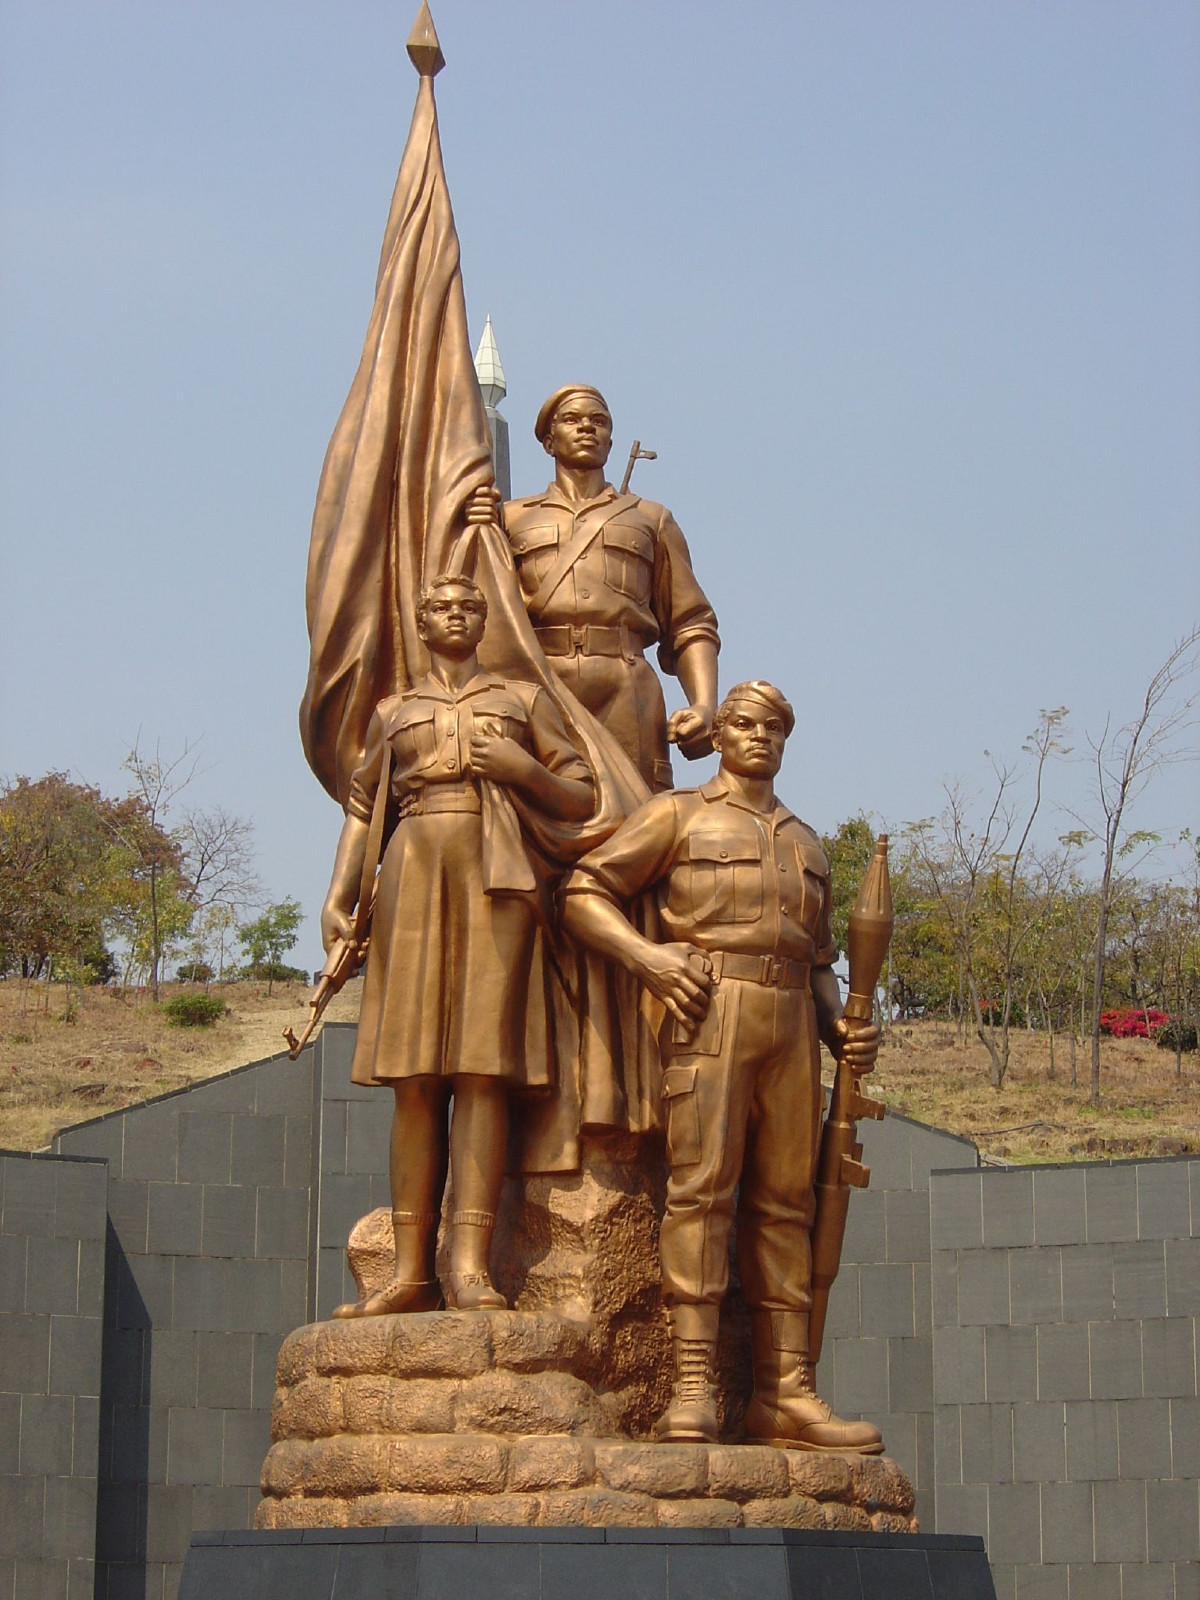 "Grab des Unbekannten Soldaten. Die Bronzestatue zeigt drei bewaffnete Guerillakämpfer – zwei Männer, eine Frau.<br> Quelle: <a href=""https://commons.wikimedia.org/wiki/File:Heroes_Acre_Monument,_Harare,_Zimbabwe.jpg"">Gary Bembridge / Wikimedia Commons</a><br> Lizenz: <a href=""https://creativecommons.org/licenses/by/2.0/de/"">Creative Commons BY 2.0</a>"